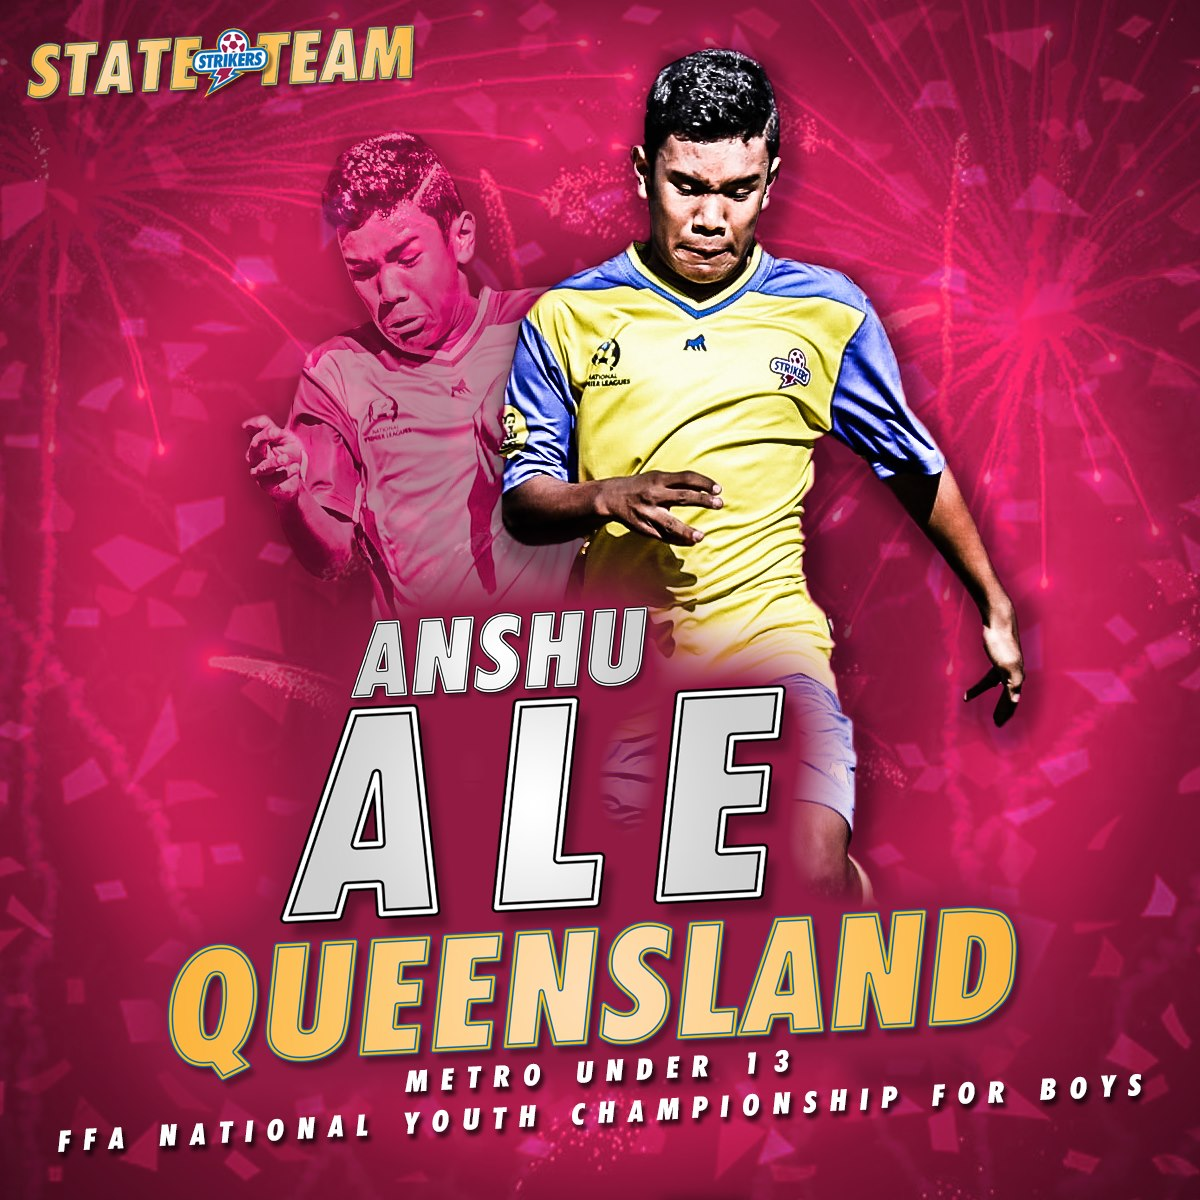 Anshu Ale Midfielder - Brisbane Strikers